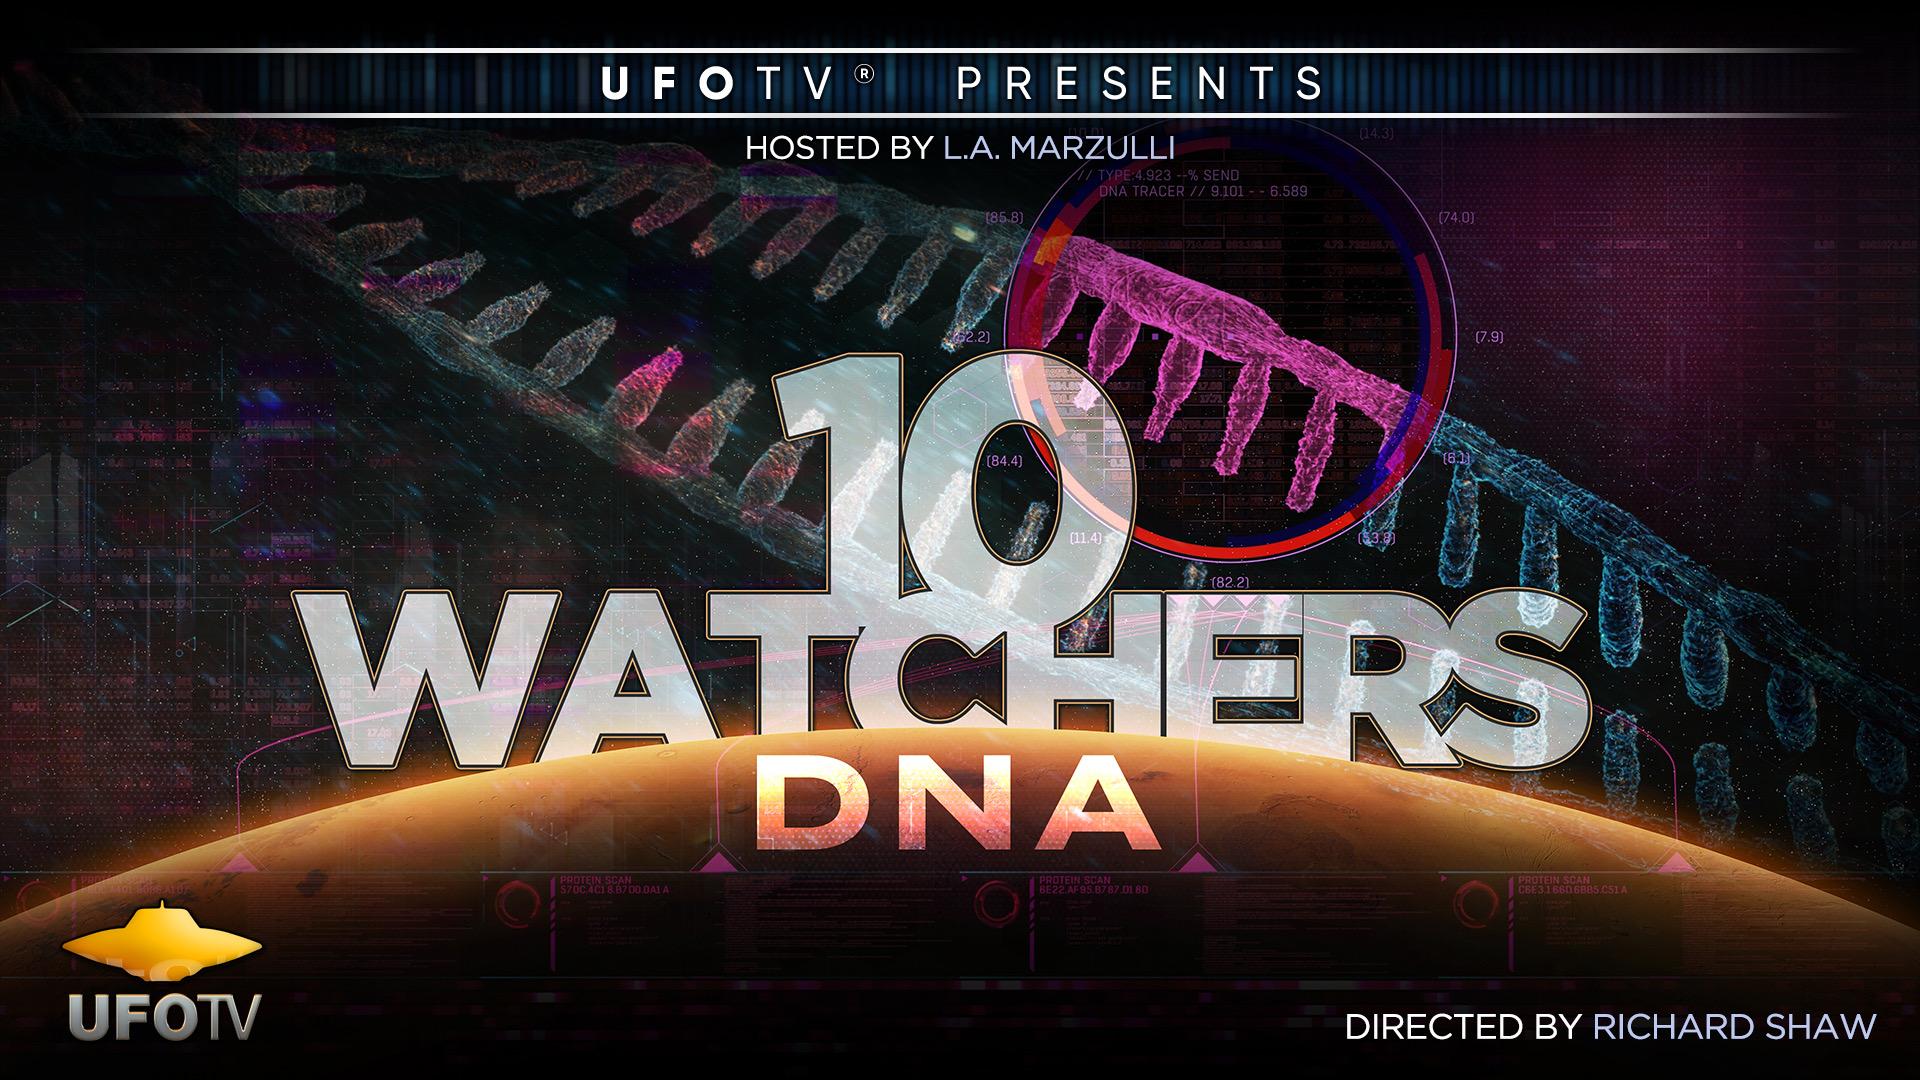 Watchers 10 - DNA